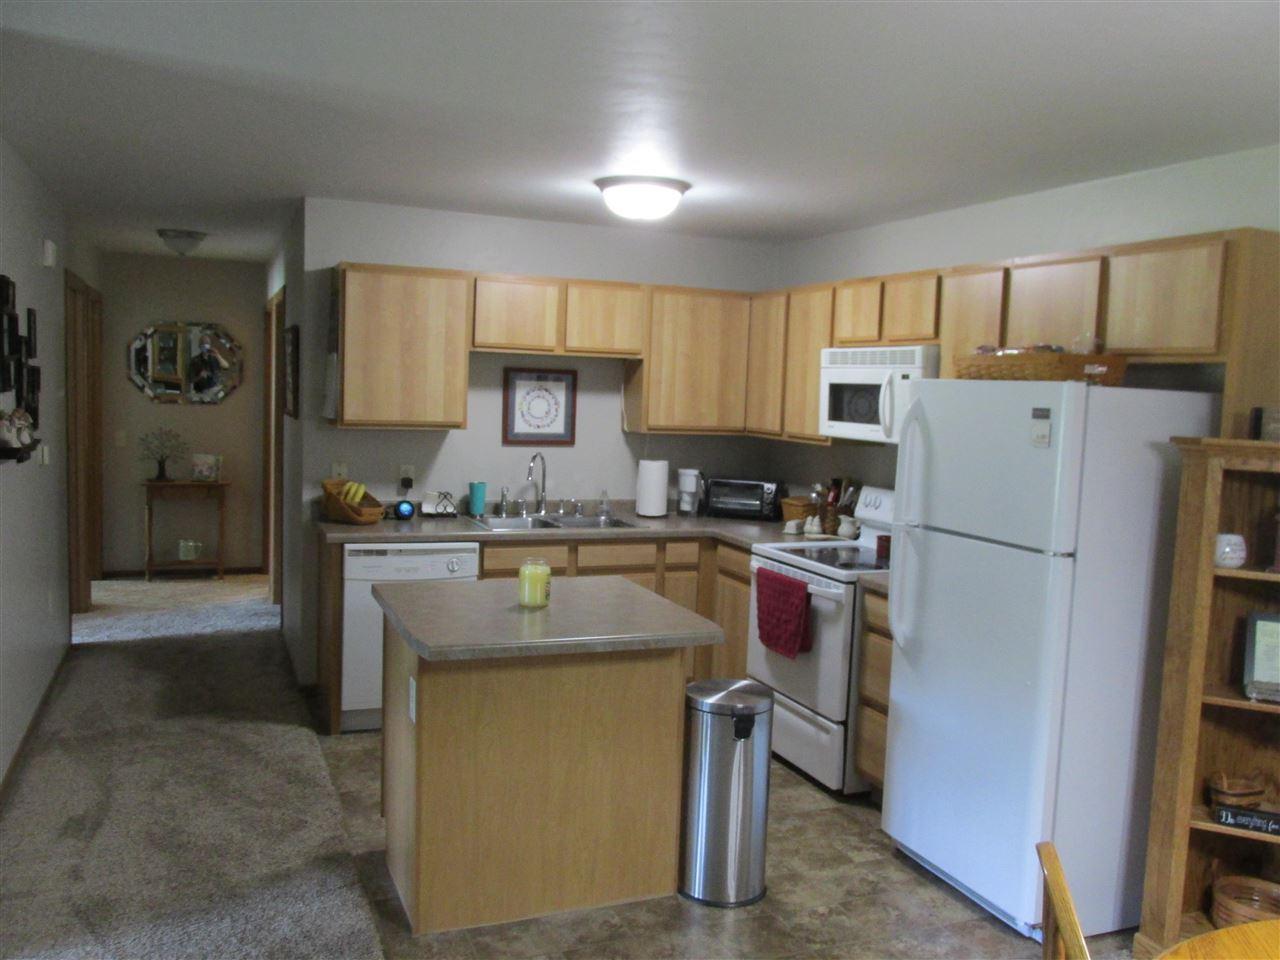 Photo of 3321 N CASALOMA Drive #61, APPLETON, WI 54913 (MLS # 50242355)